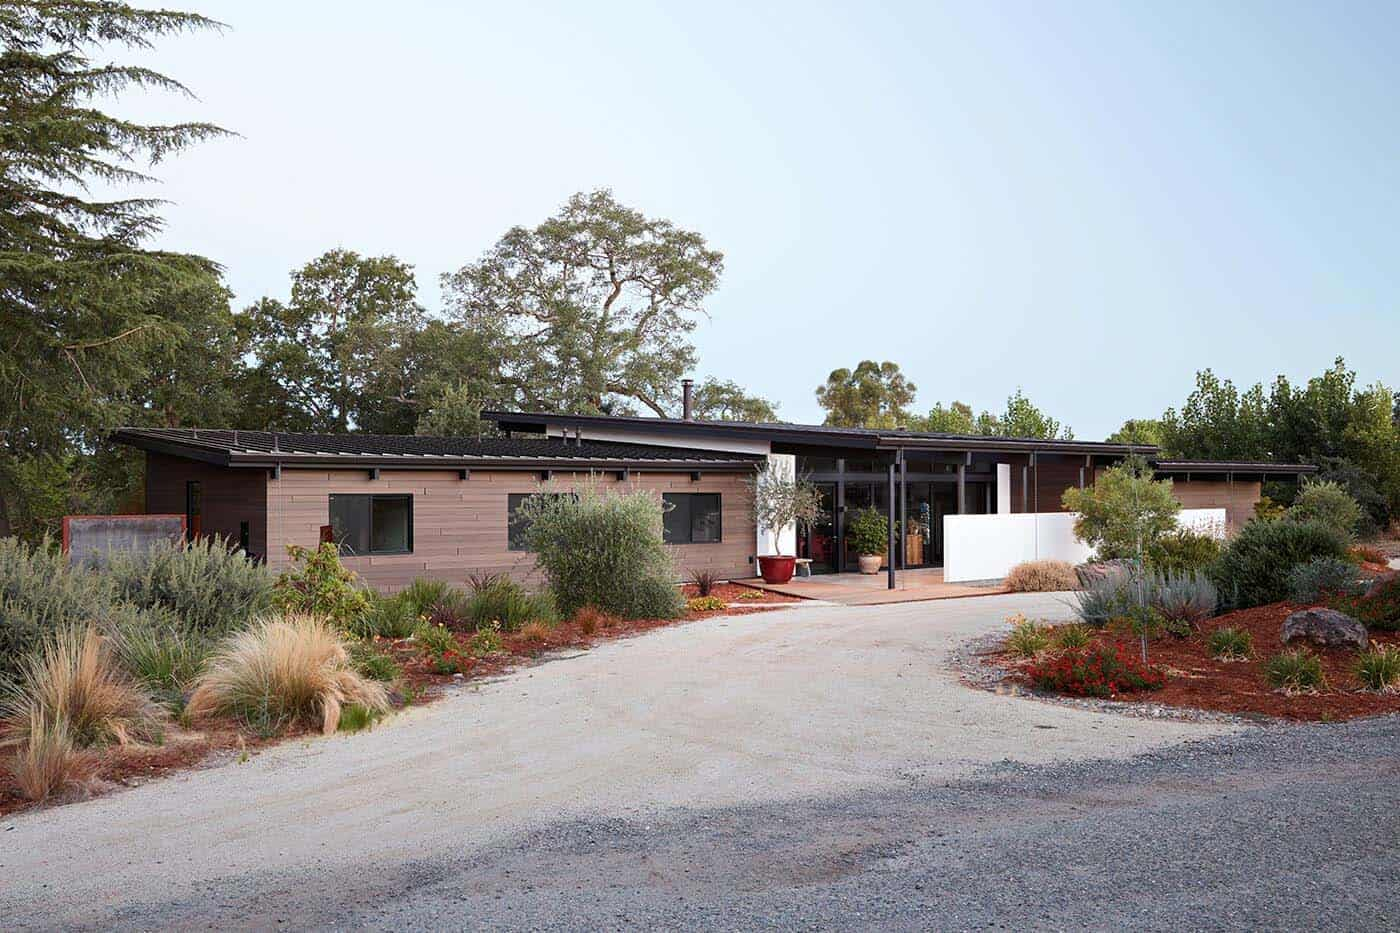 Sacramento Modern Residence-Klopf Architecture-20-1 Kindesign